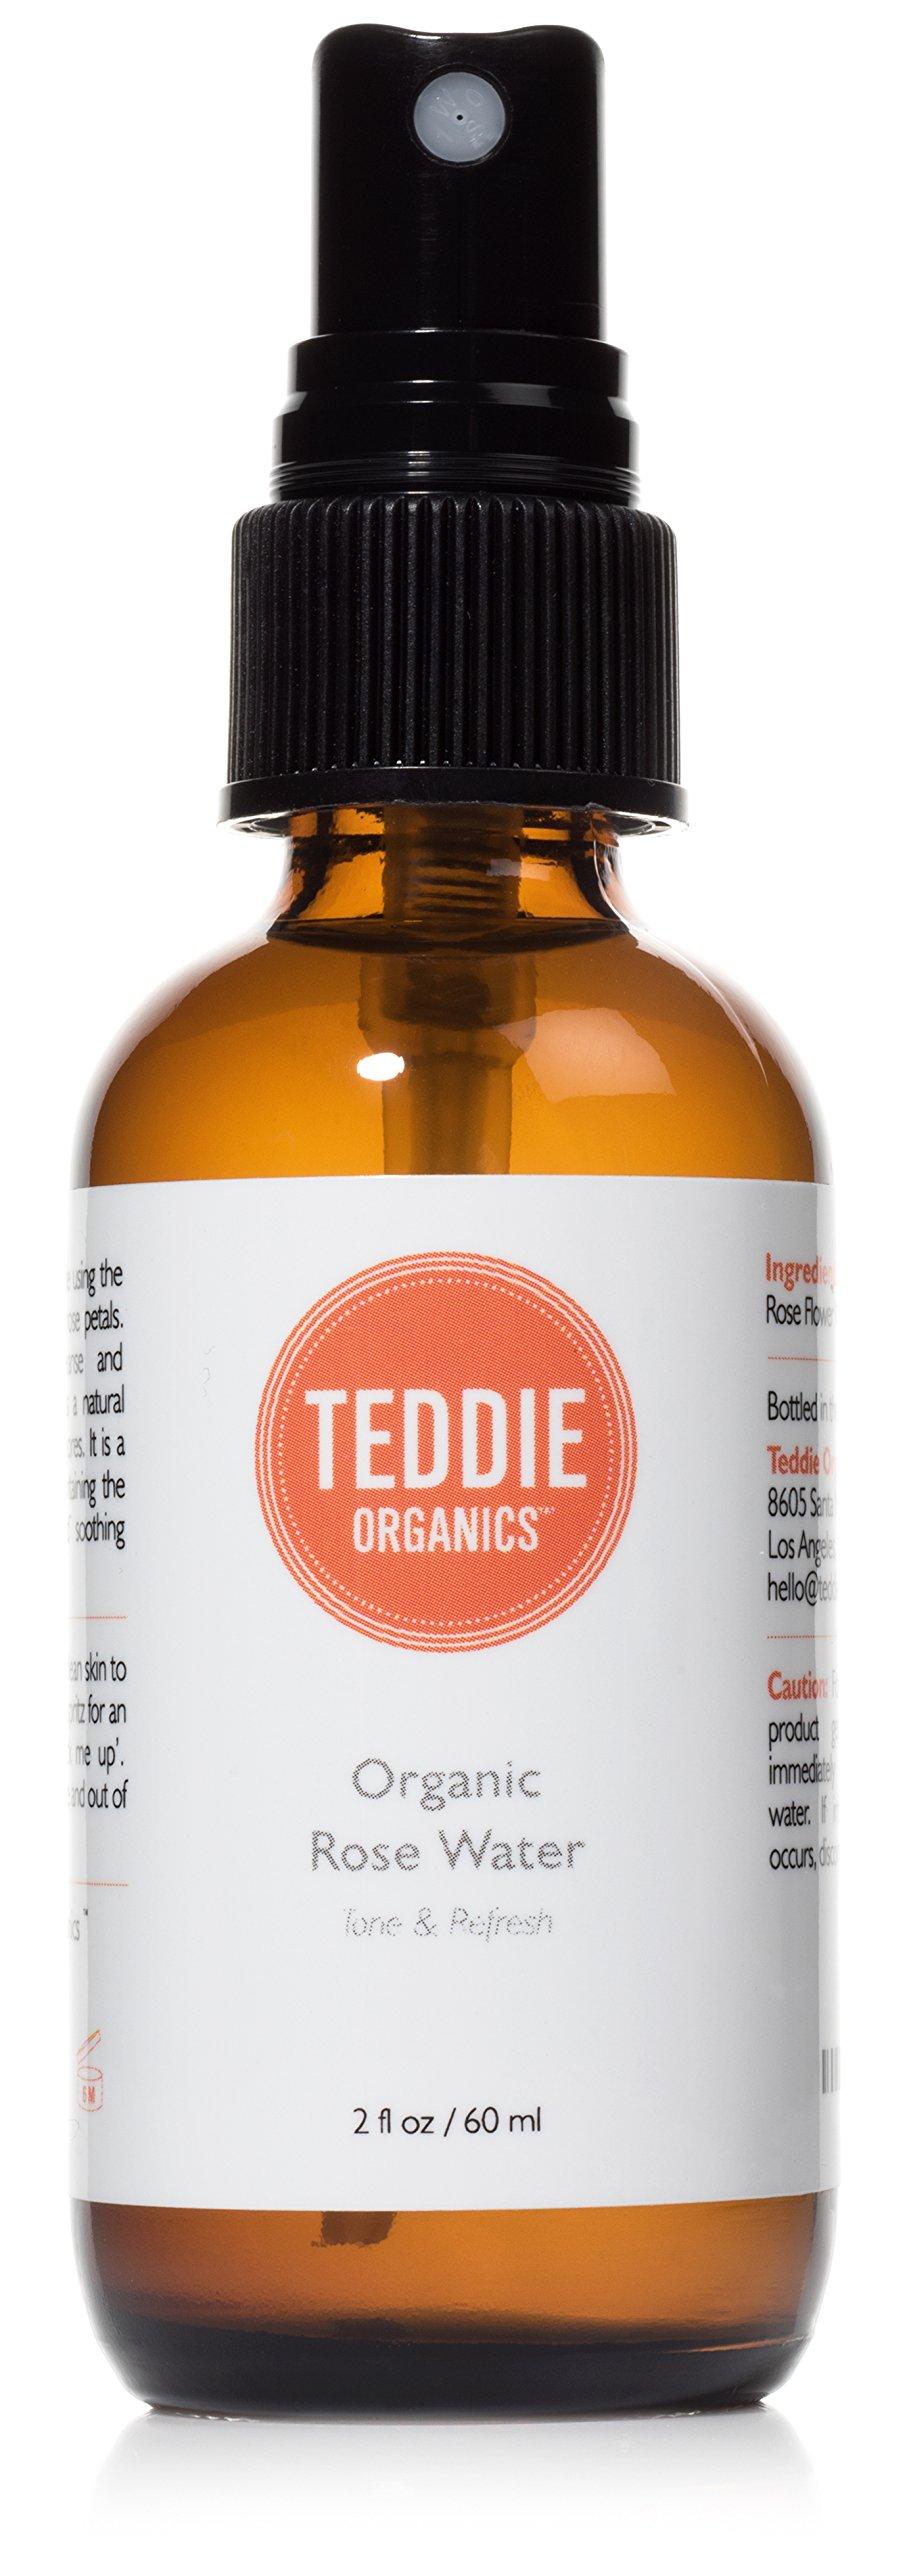 Teddie Organics Rose Water Facial Toner Spray 2oz